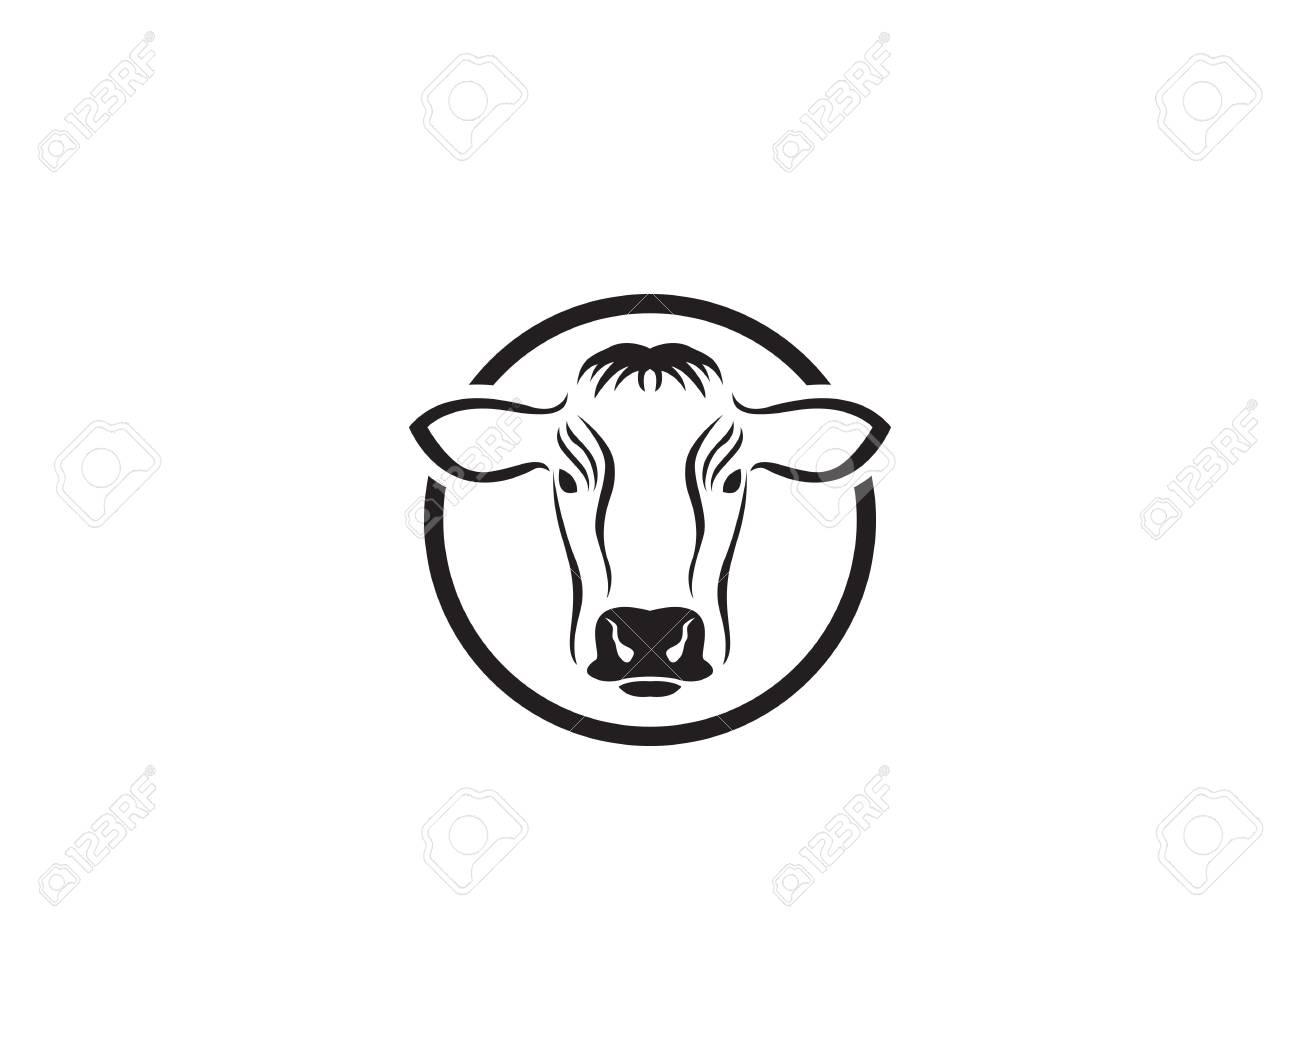 Cow Template   Cow Template Vector Icon Illustration Design Lizenzfrei Nutzbare